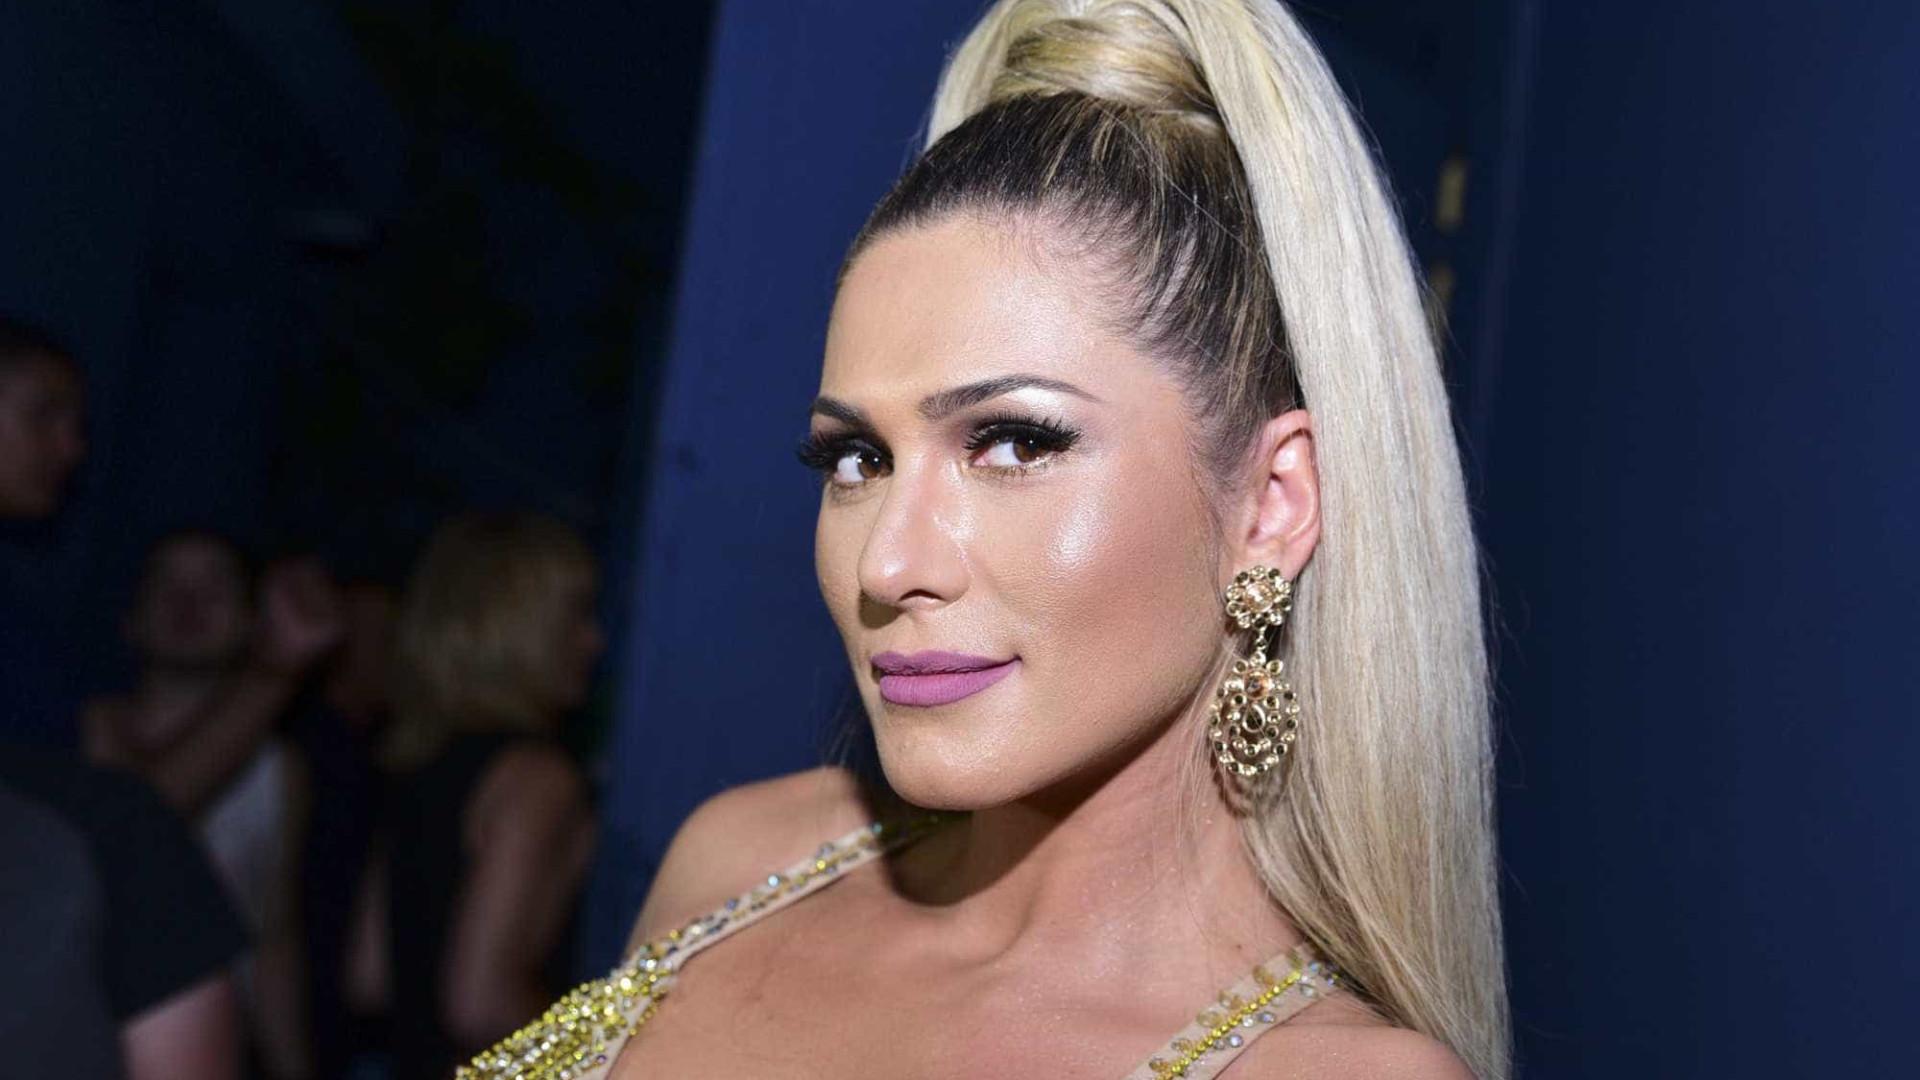 Lívia Andrade gera tumulto no casamento de Lexa e MC Guimê